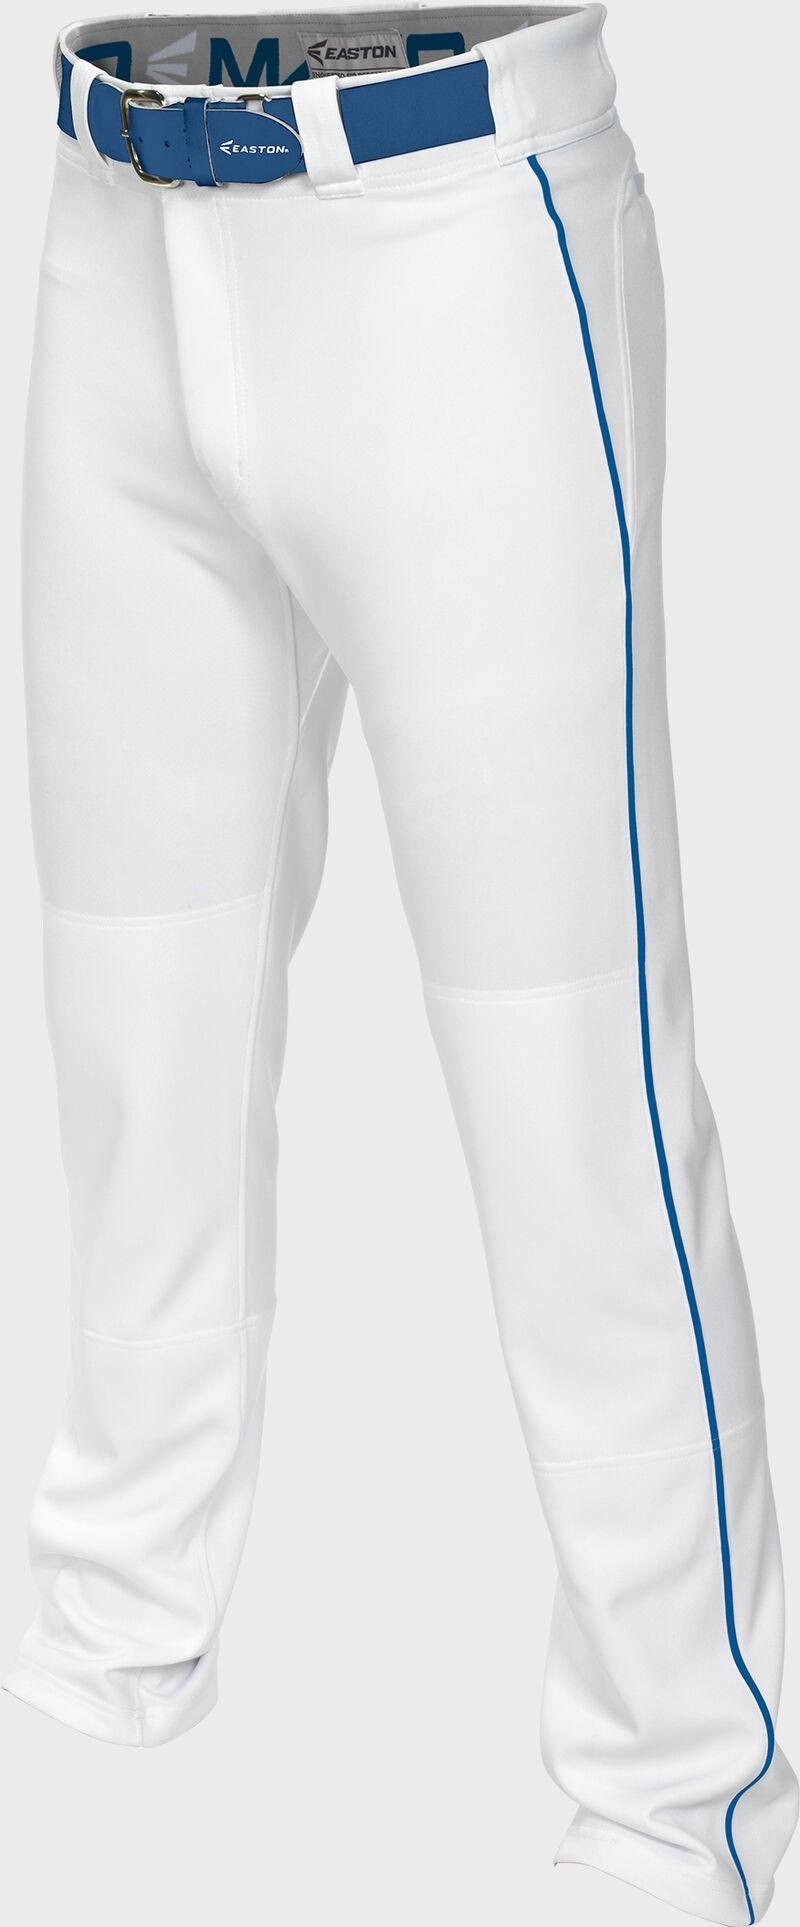 Mako 2 Pant Adult Piped WHITE/ROYAL  S